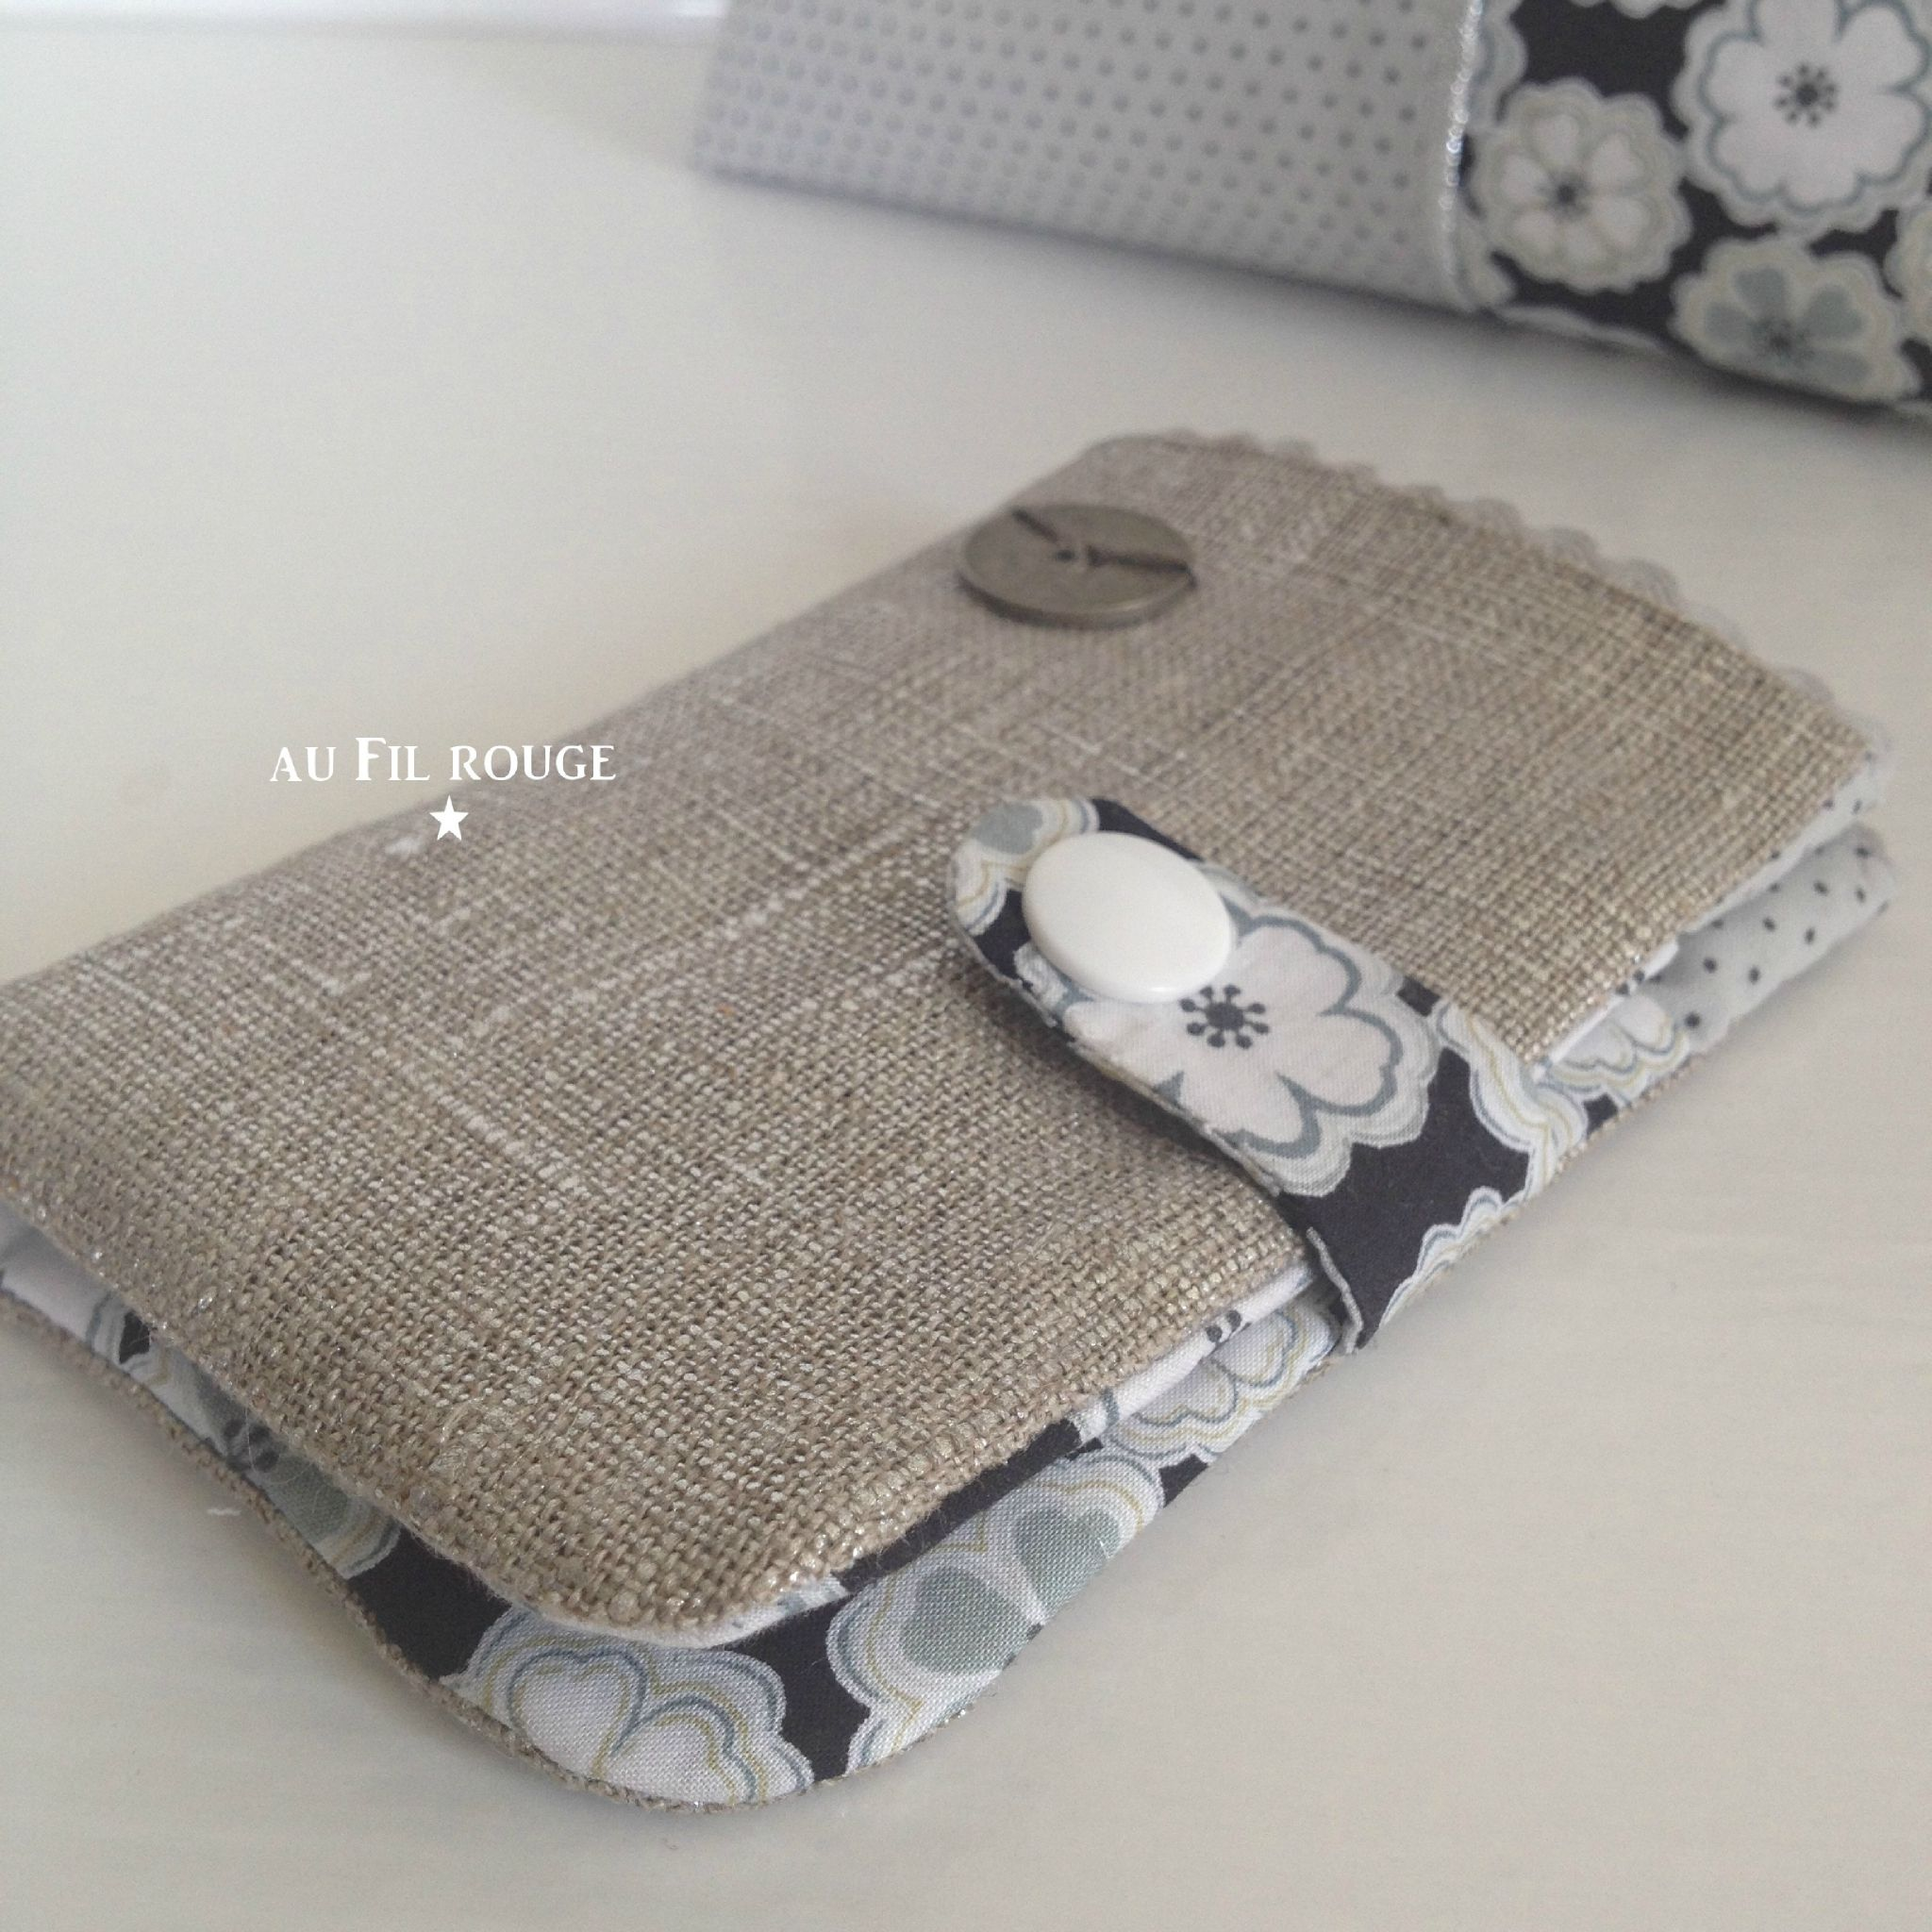 pochette voyage couture voyage pinterest pochette voyage pochettes et sac. Black Bedroom Furniture Sets. Home Design Ideas